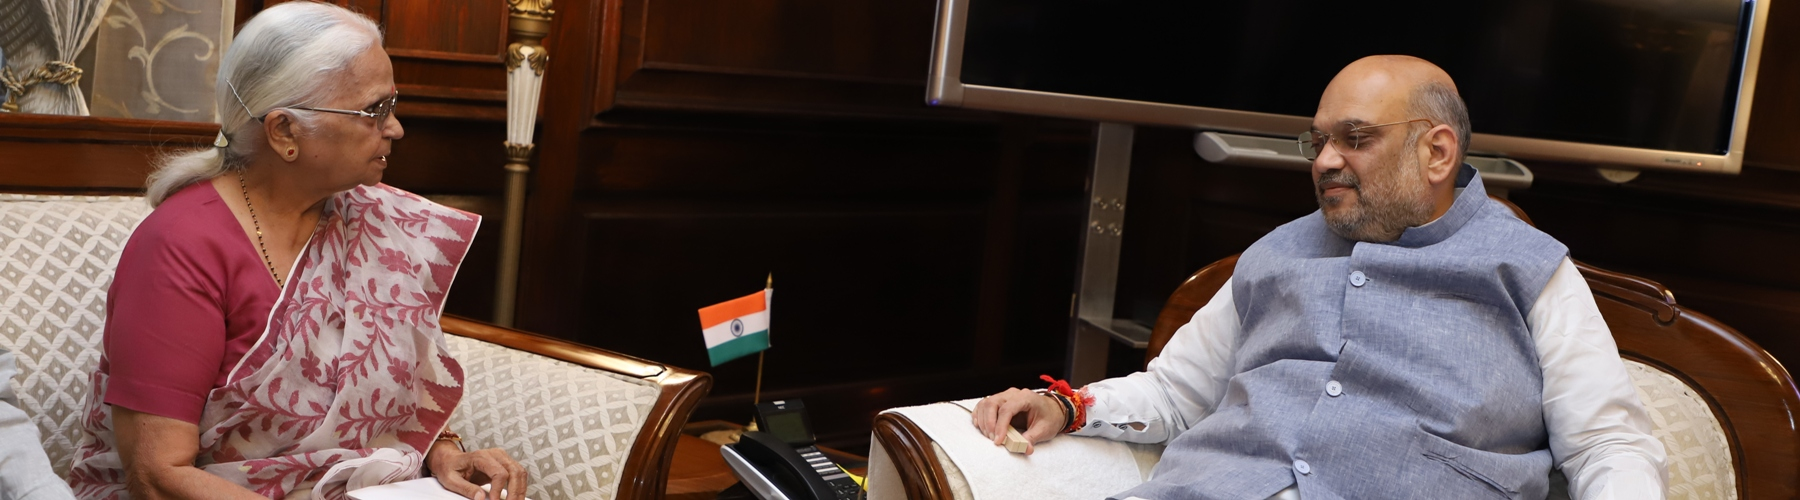 The Governor of Goa Smt. Mridula Sinha calling on Union Home Minister Shri Amit Shah in New Delhi on June 14, 2019.